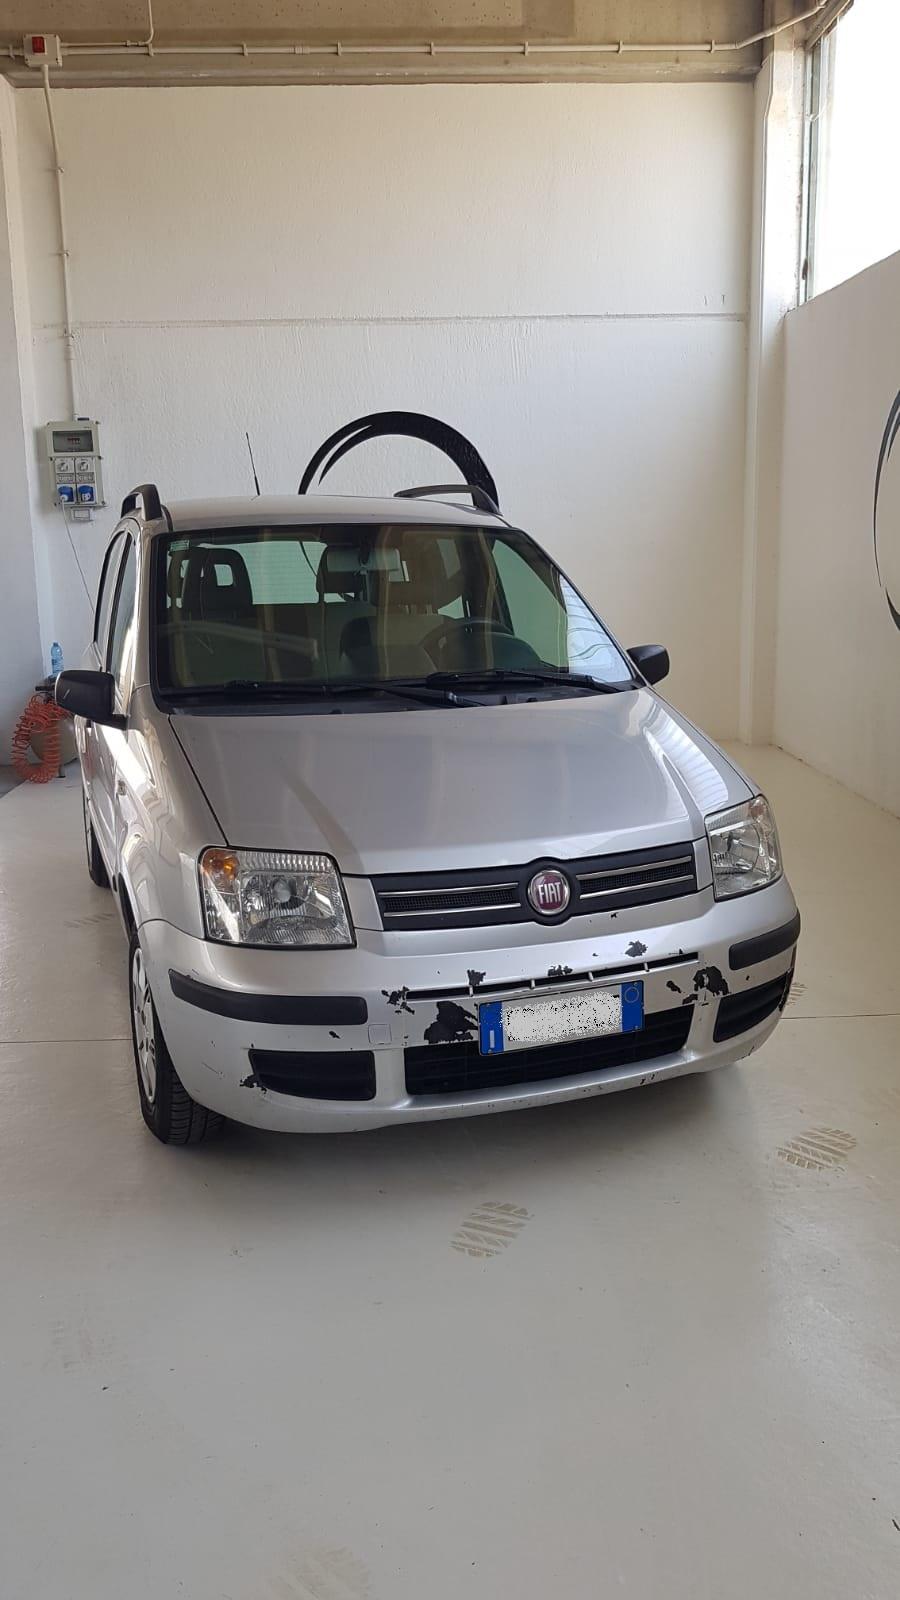 Fiat Panda 1.2 GPL 6